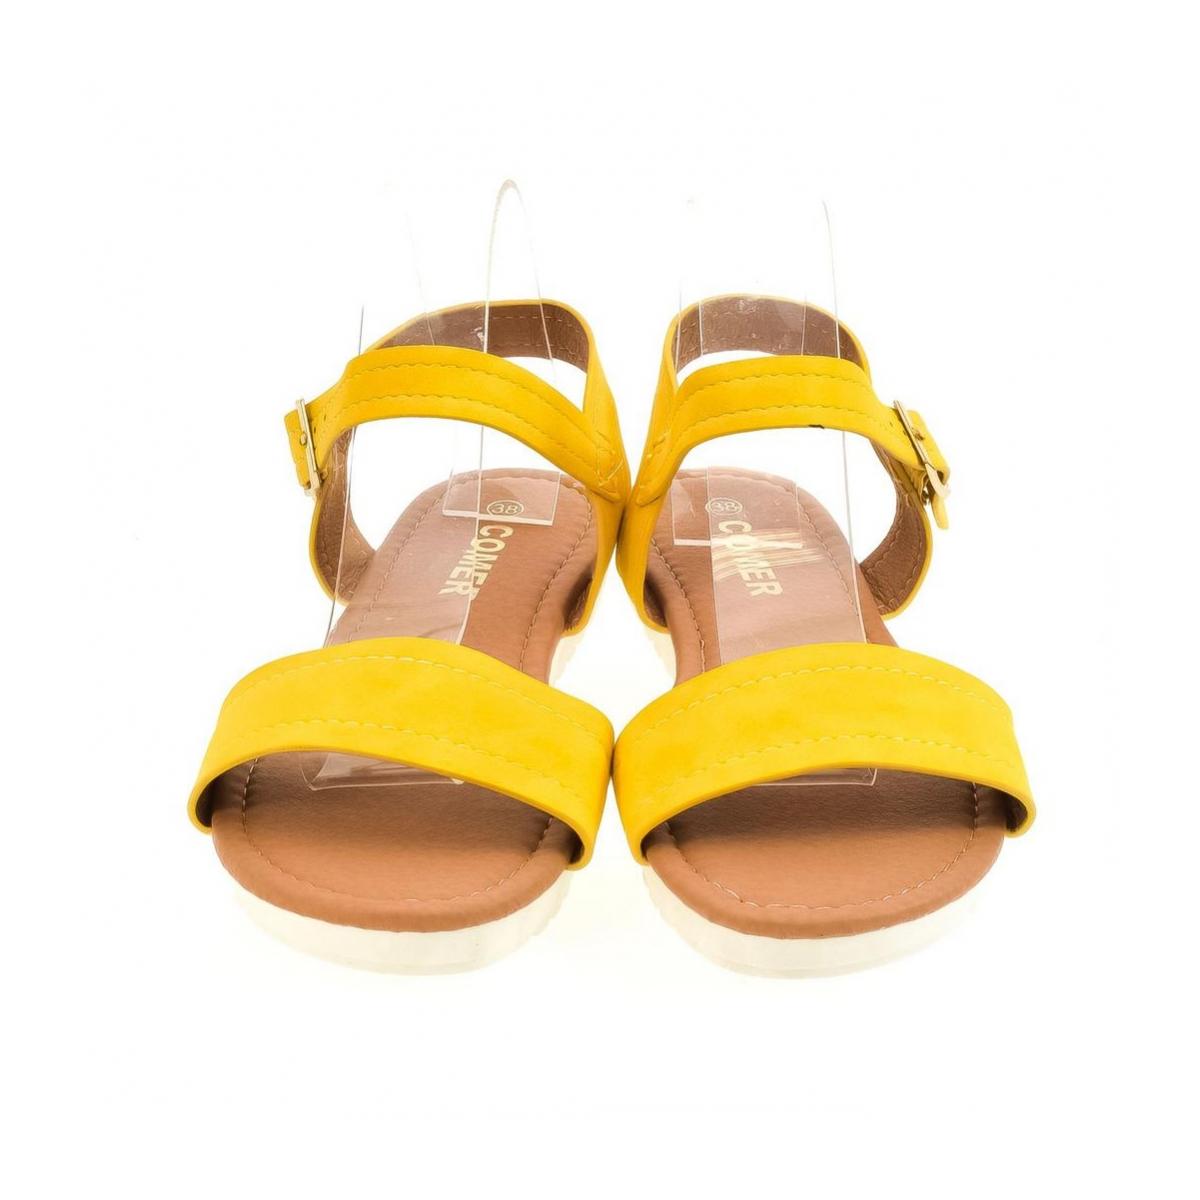 2451aee9f018d Dámske žlté sandále HILFA   Johnc.sk